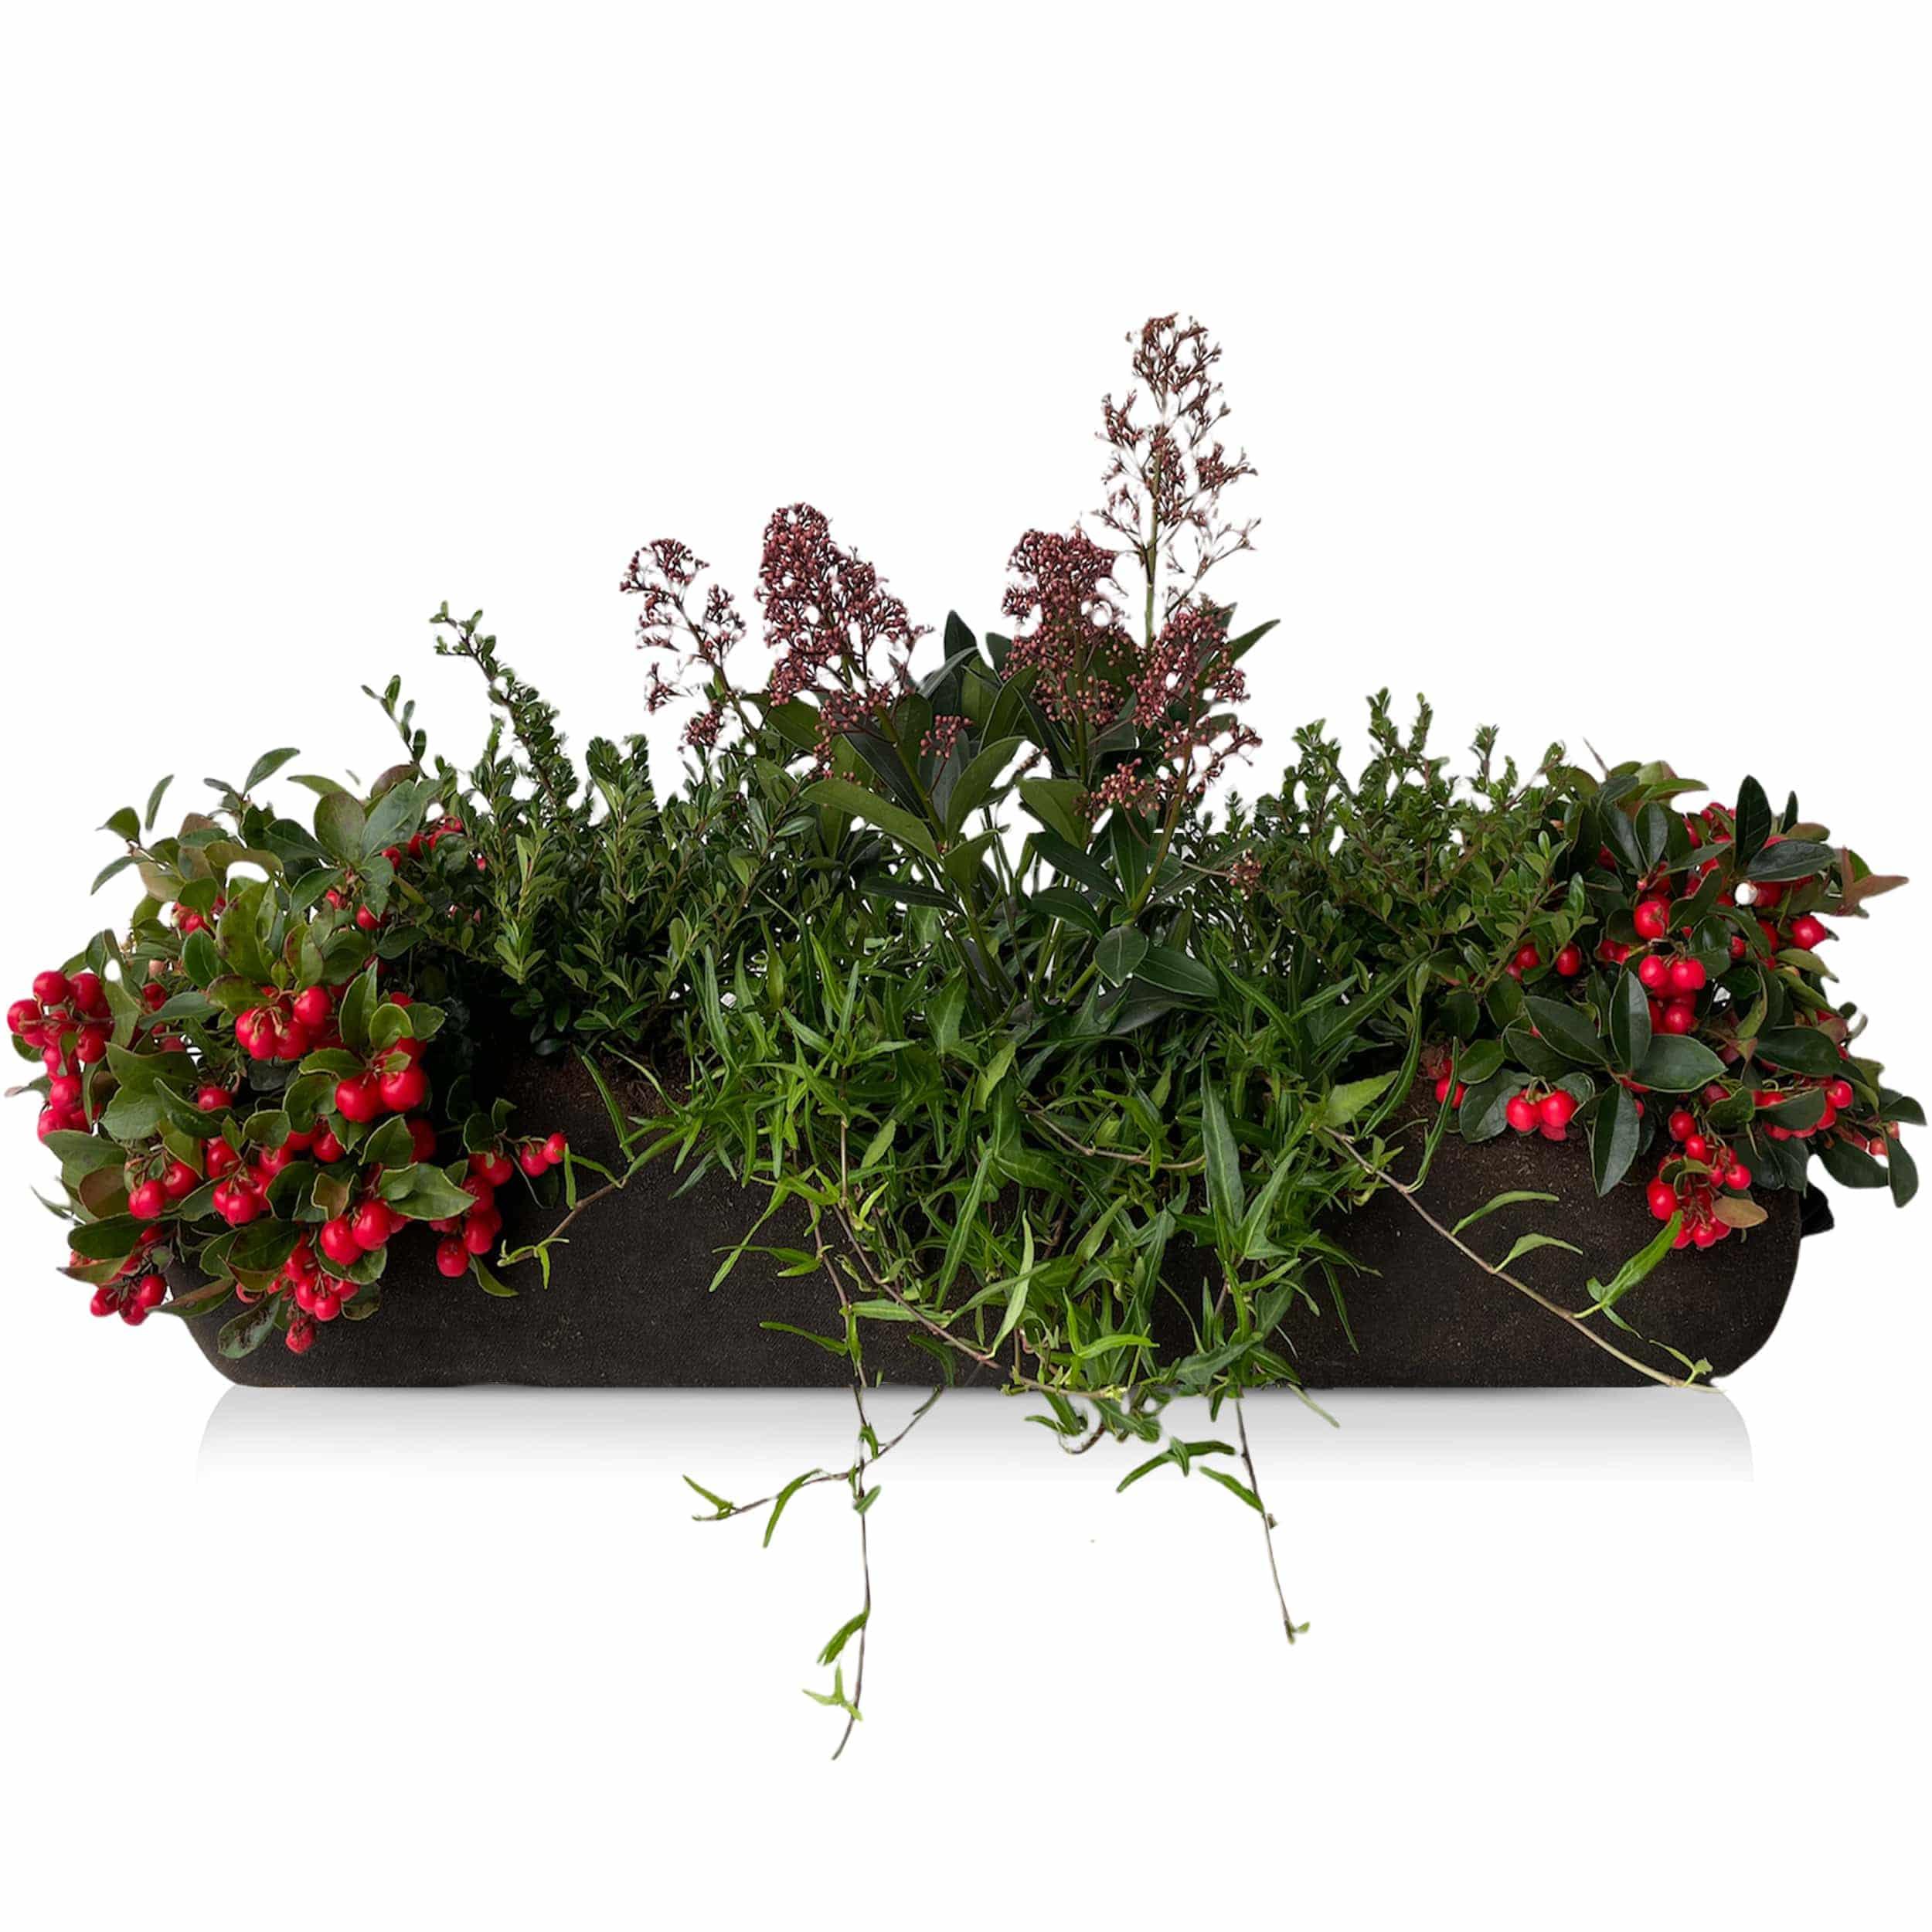 Winterblumen 'Beerenrot' Bag-Länge: 70 cm